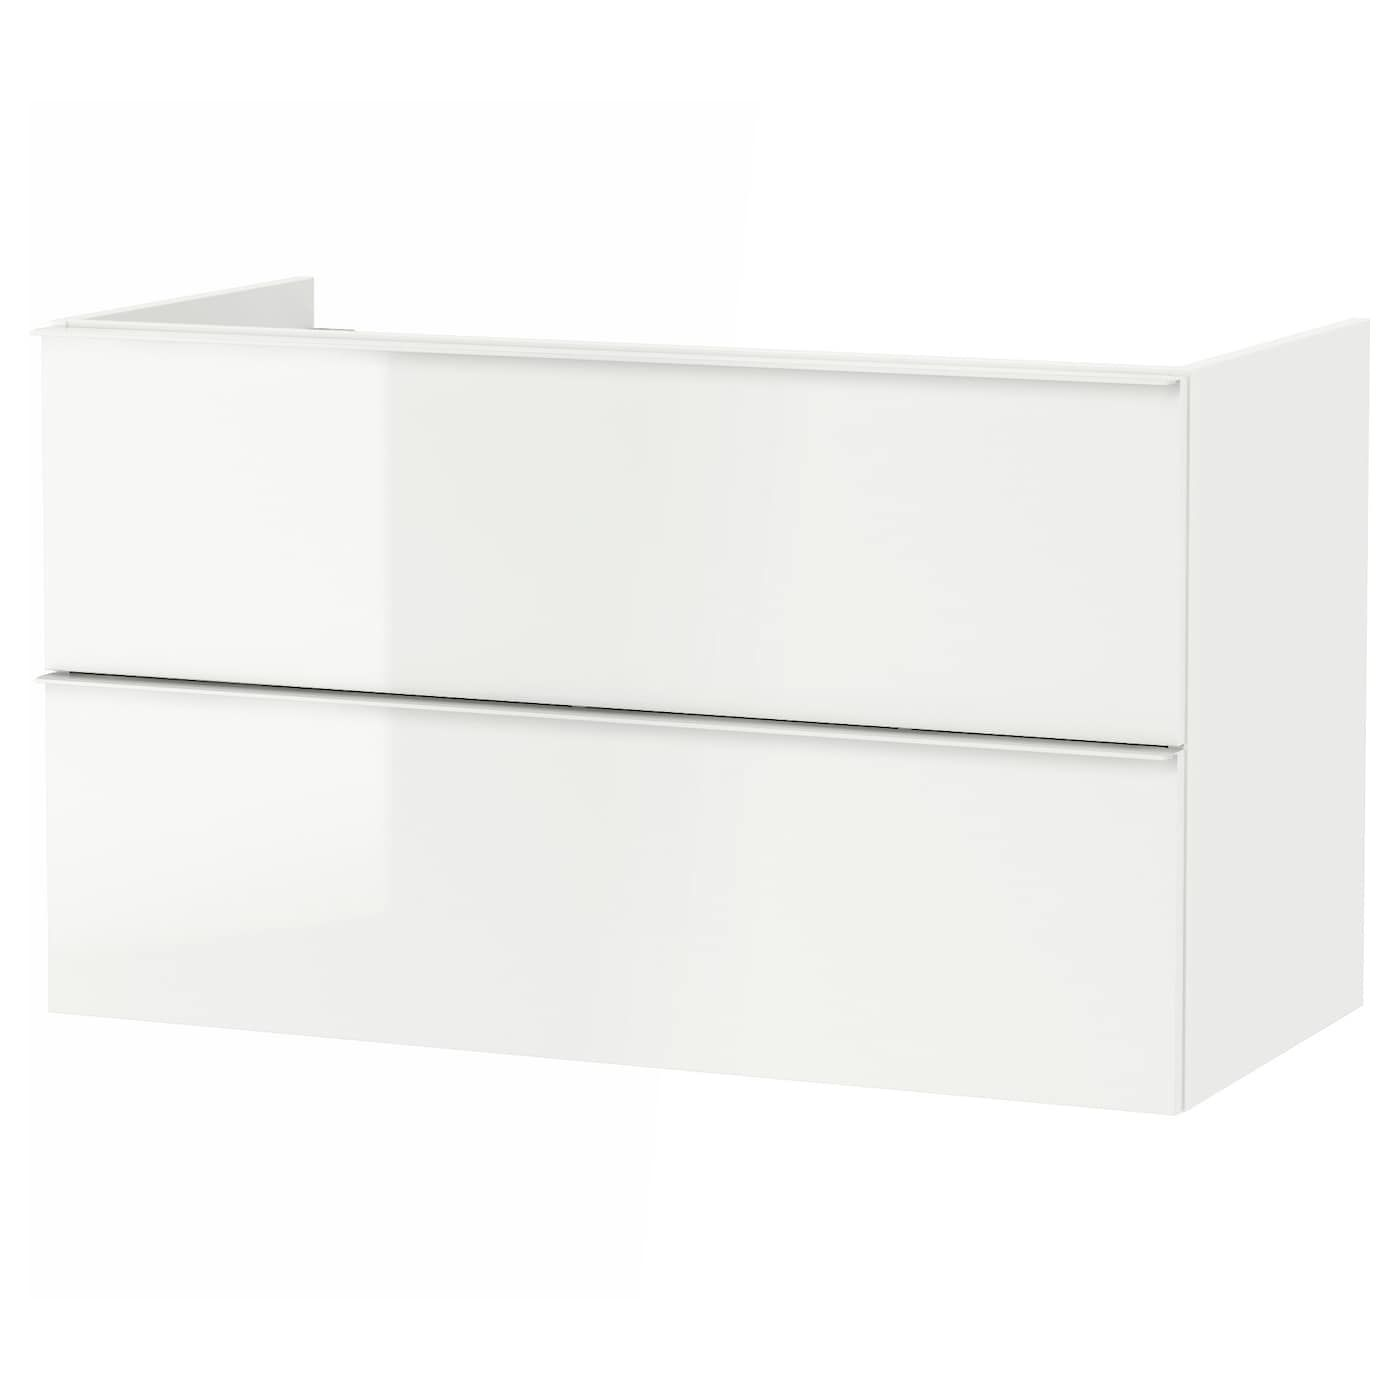 IKEA High Gloss White Sink with 2